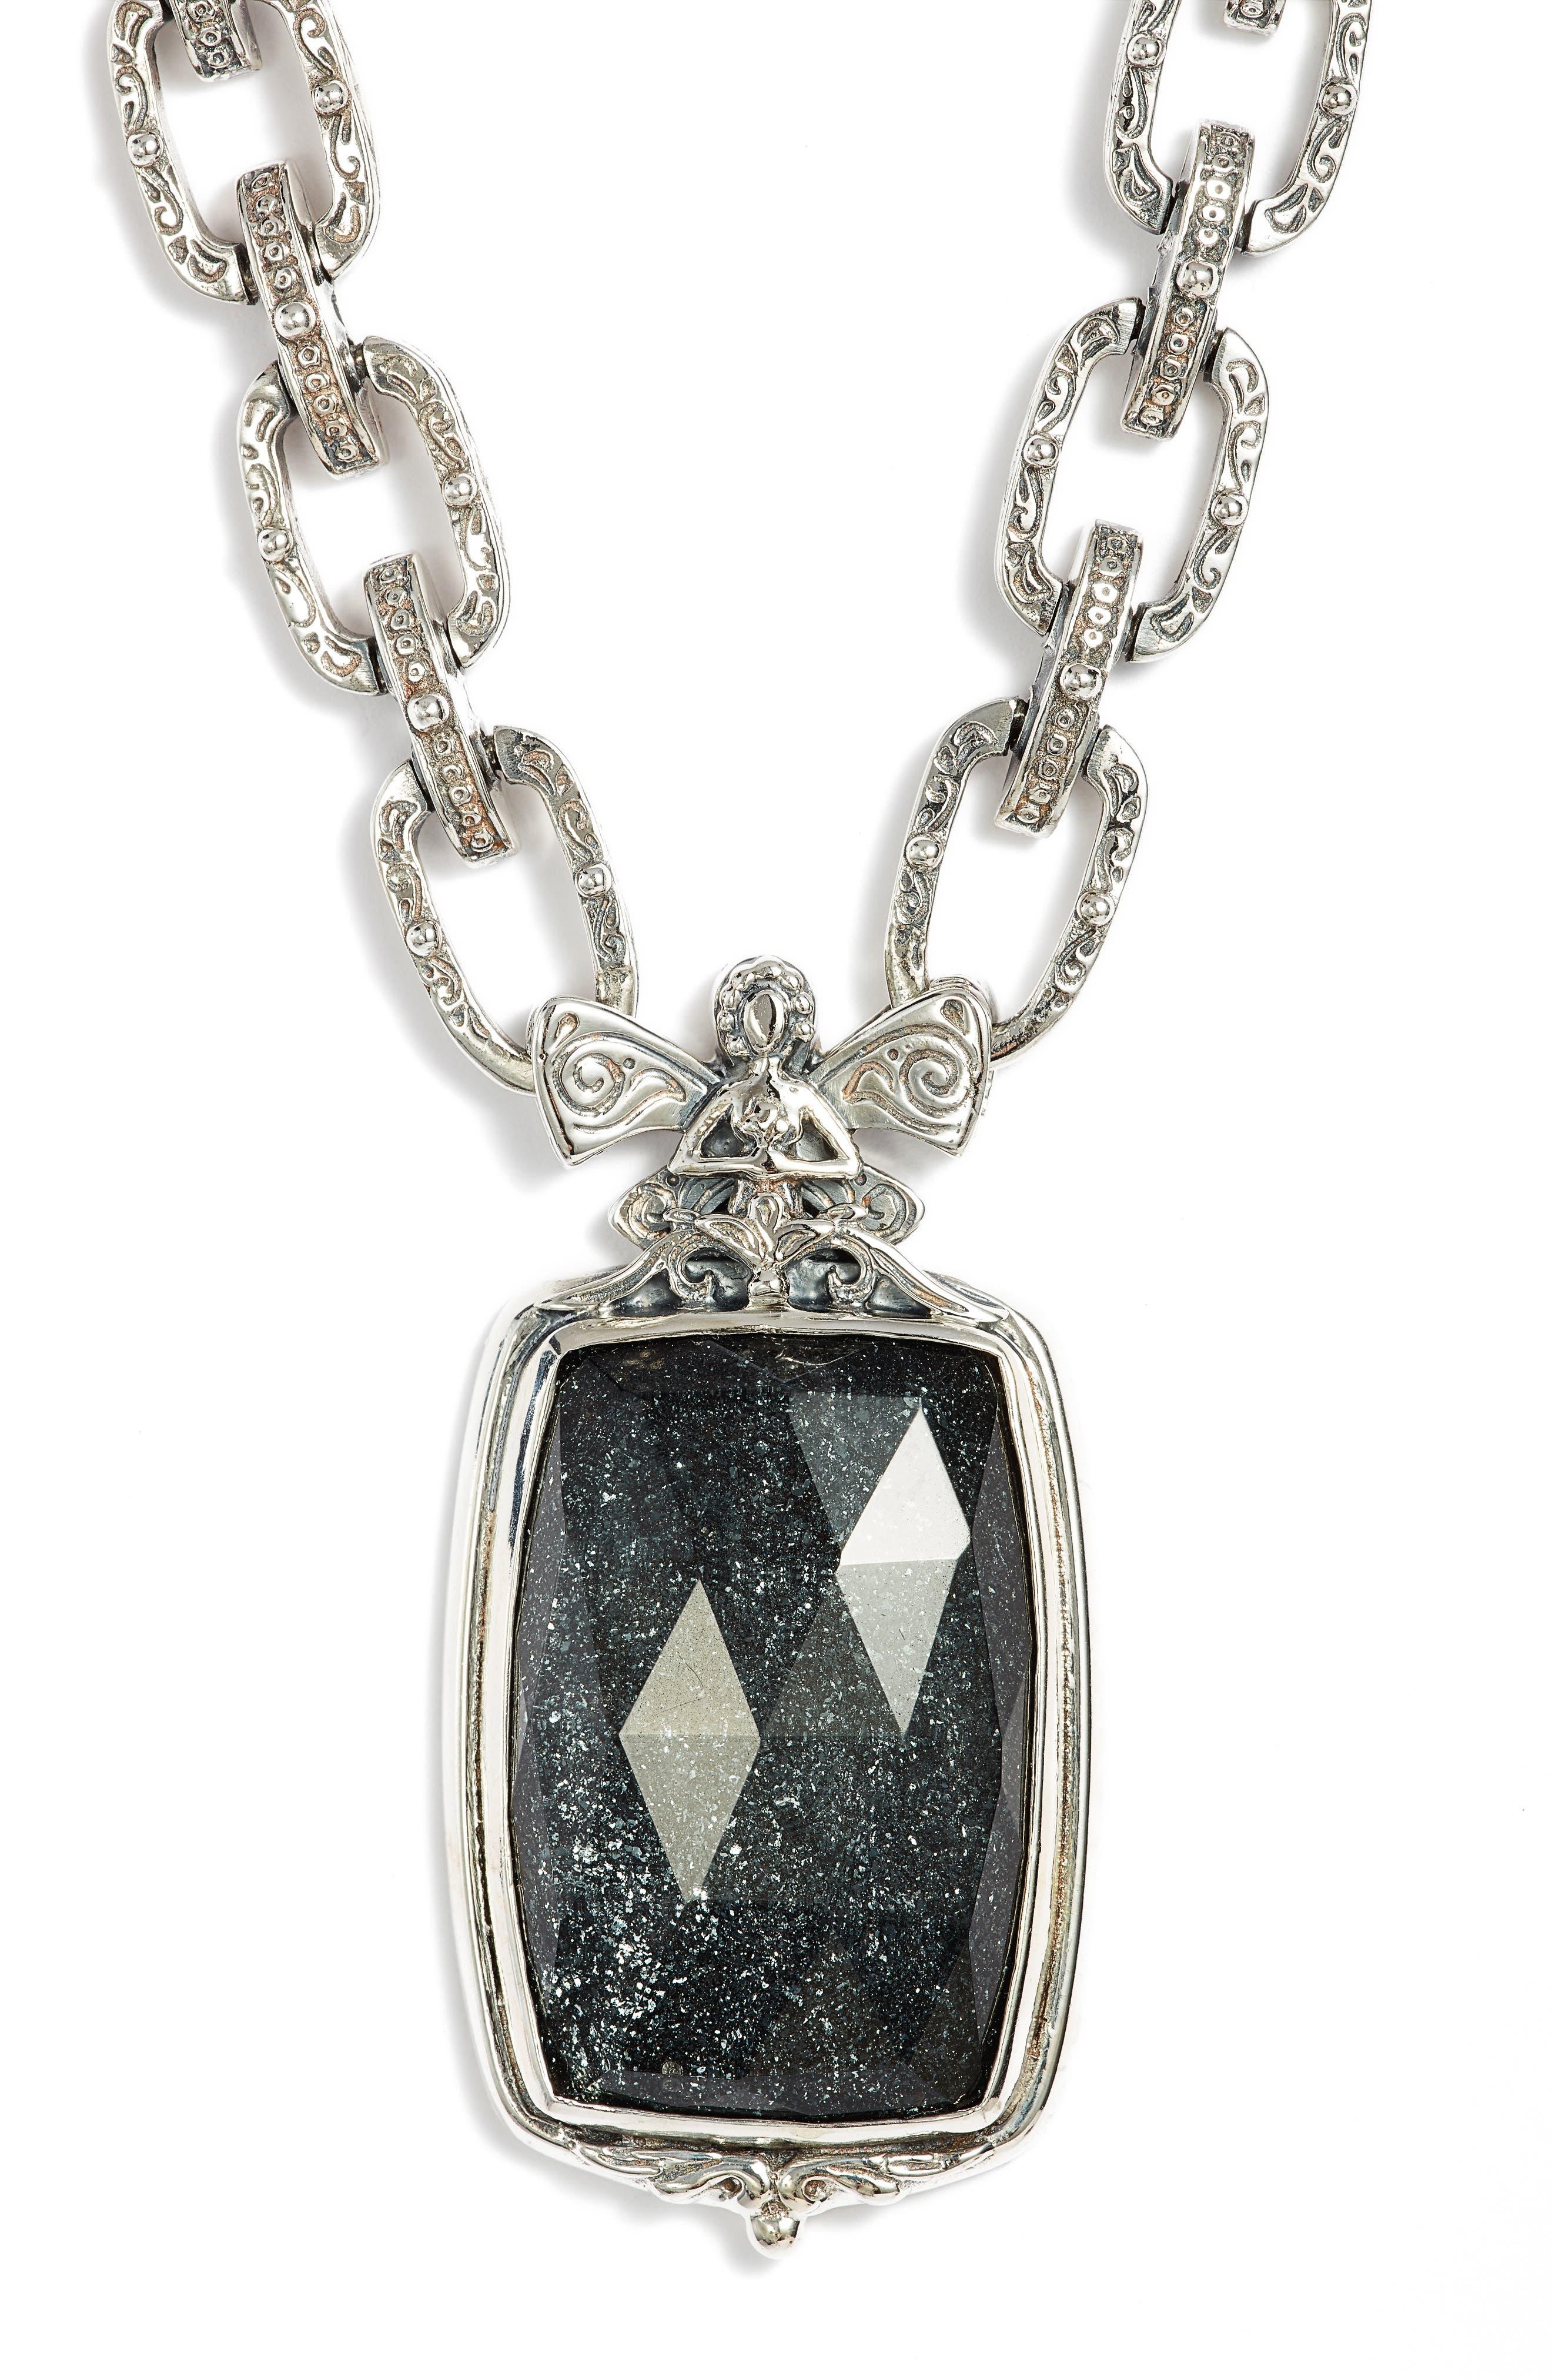 Santorini Hematite Pendant Necklace,                         Main,                         color, Silver/ Hematite